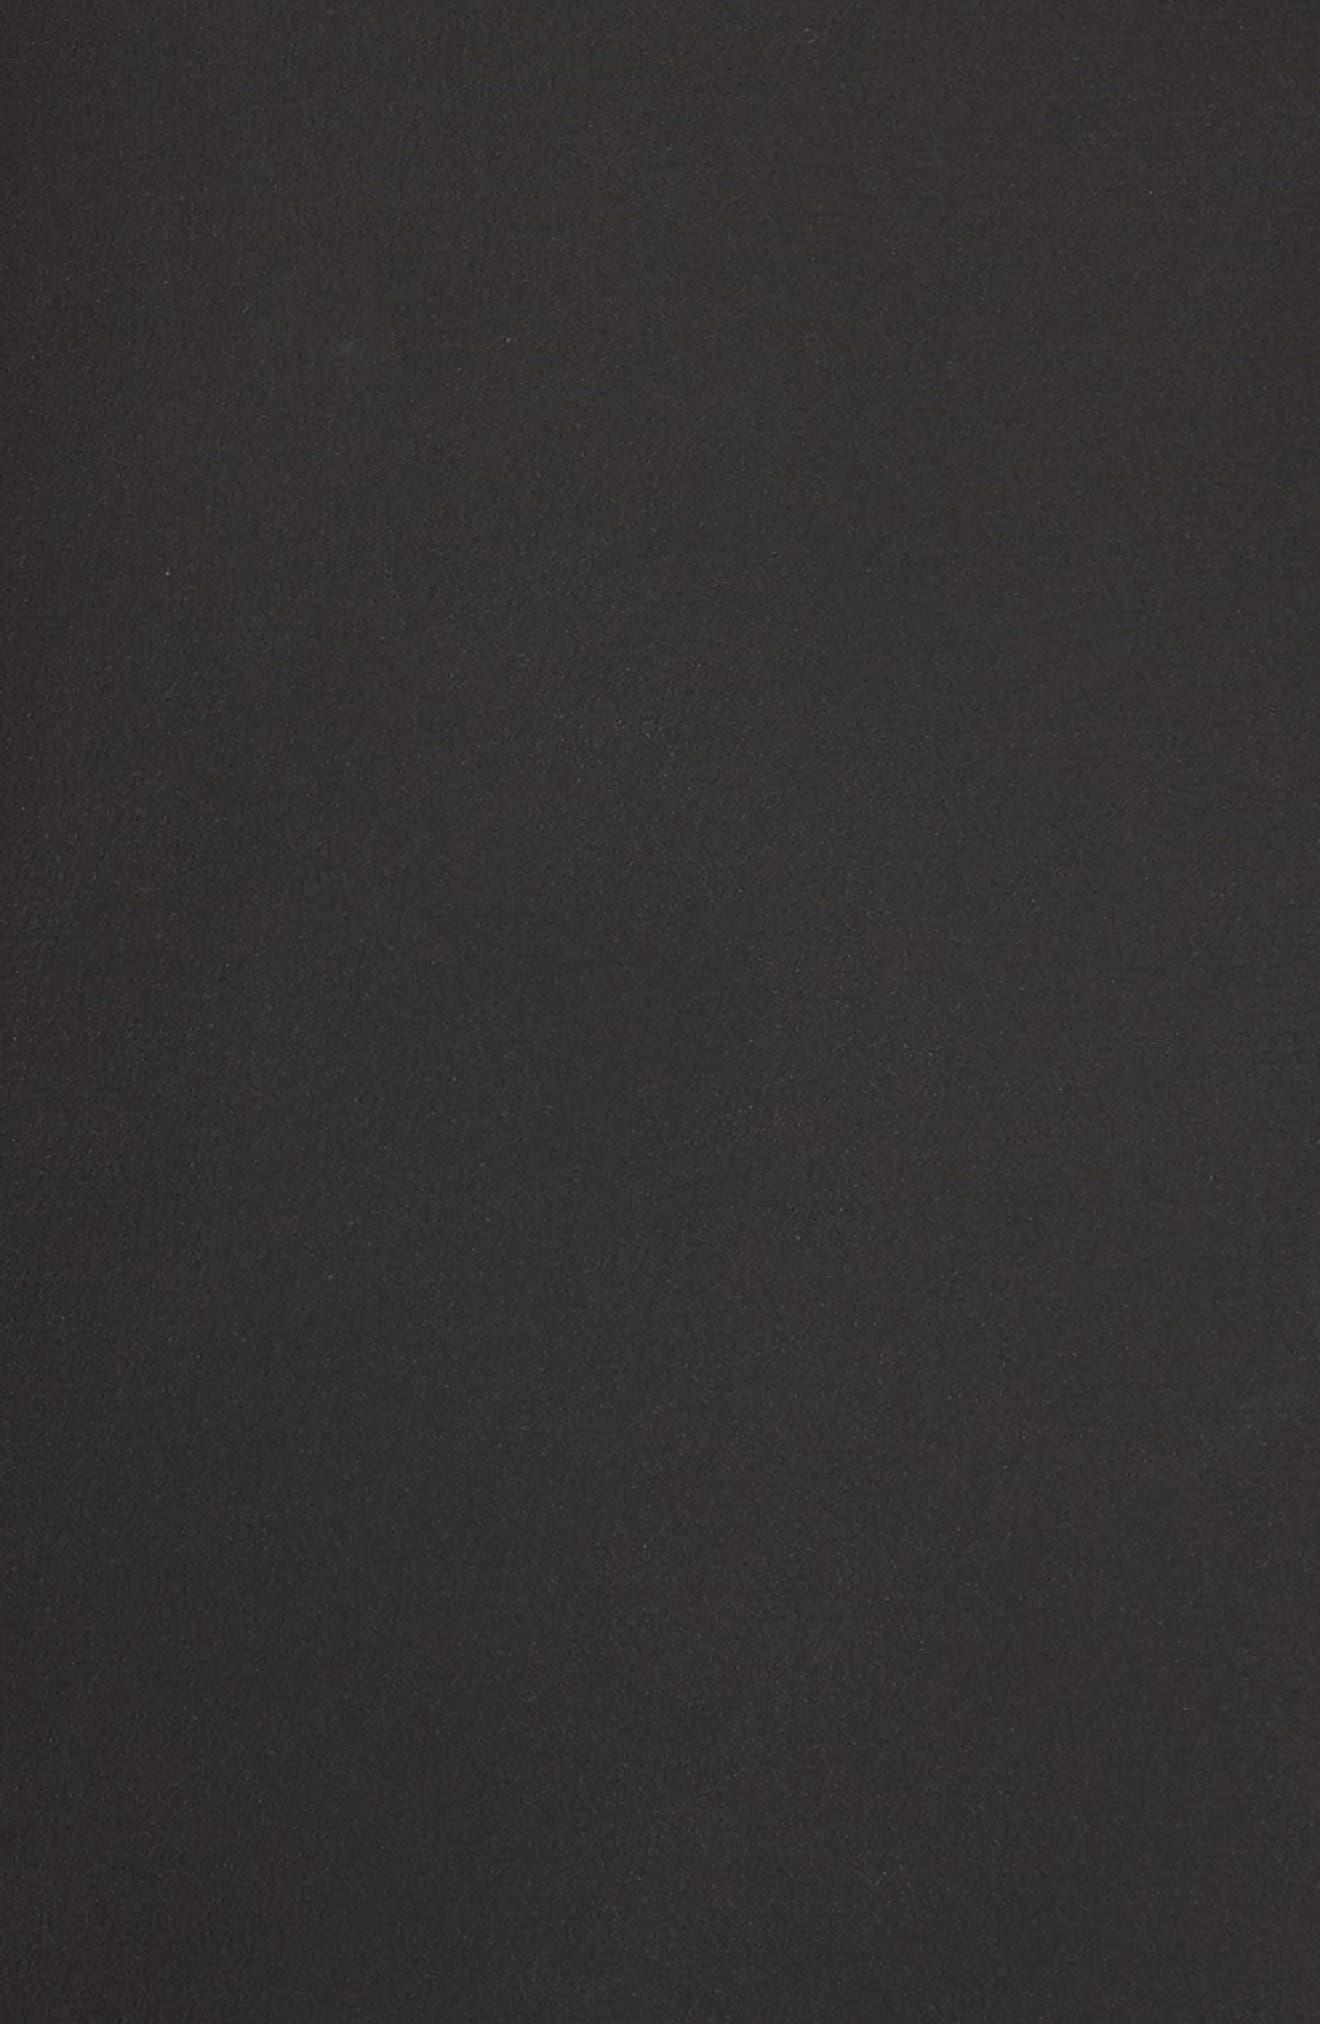 Tulle Lined Minidress,                             Alternate thumbnail 6, color,                             Black